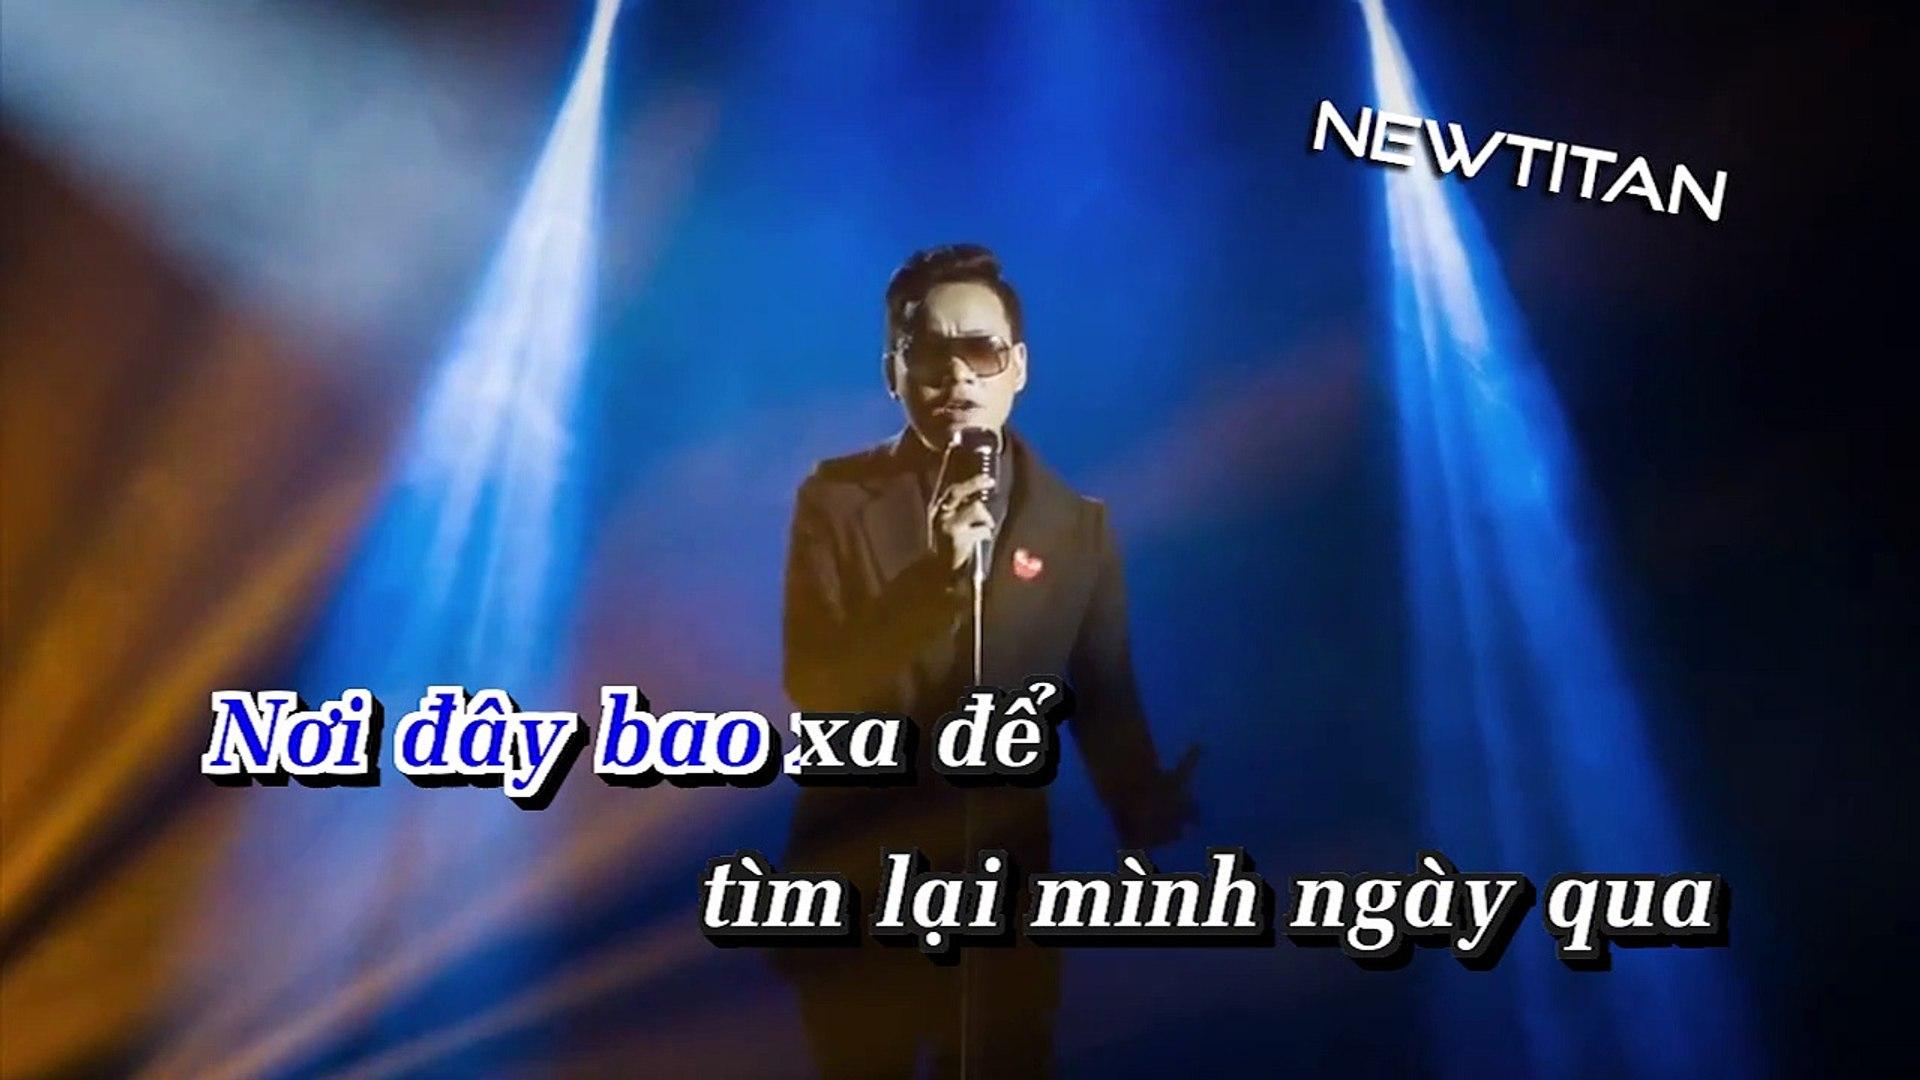 [Karaoke] 2Am - Justatee Ft. Bigdaddy [Beat]